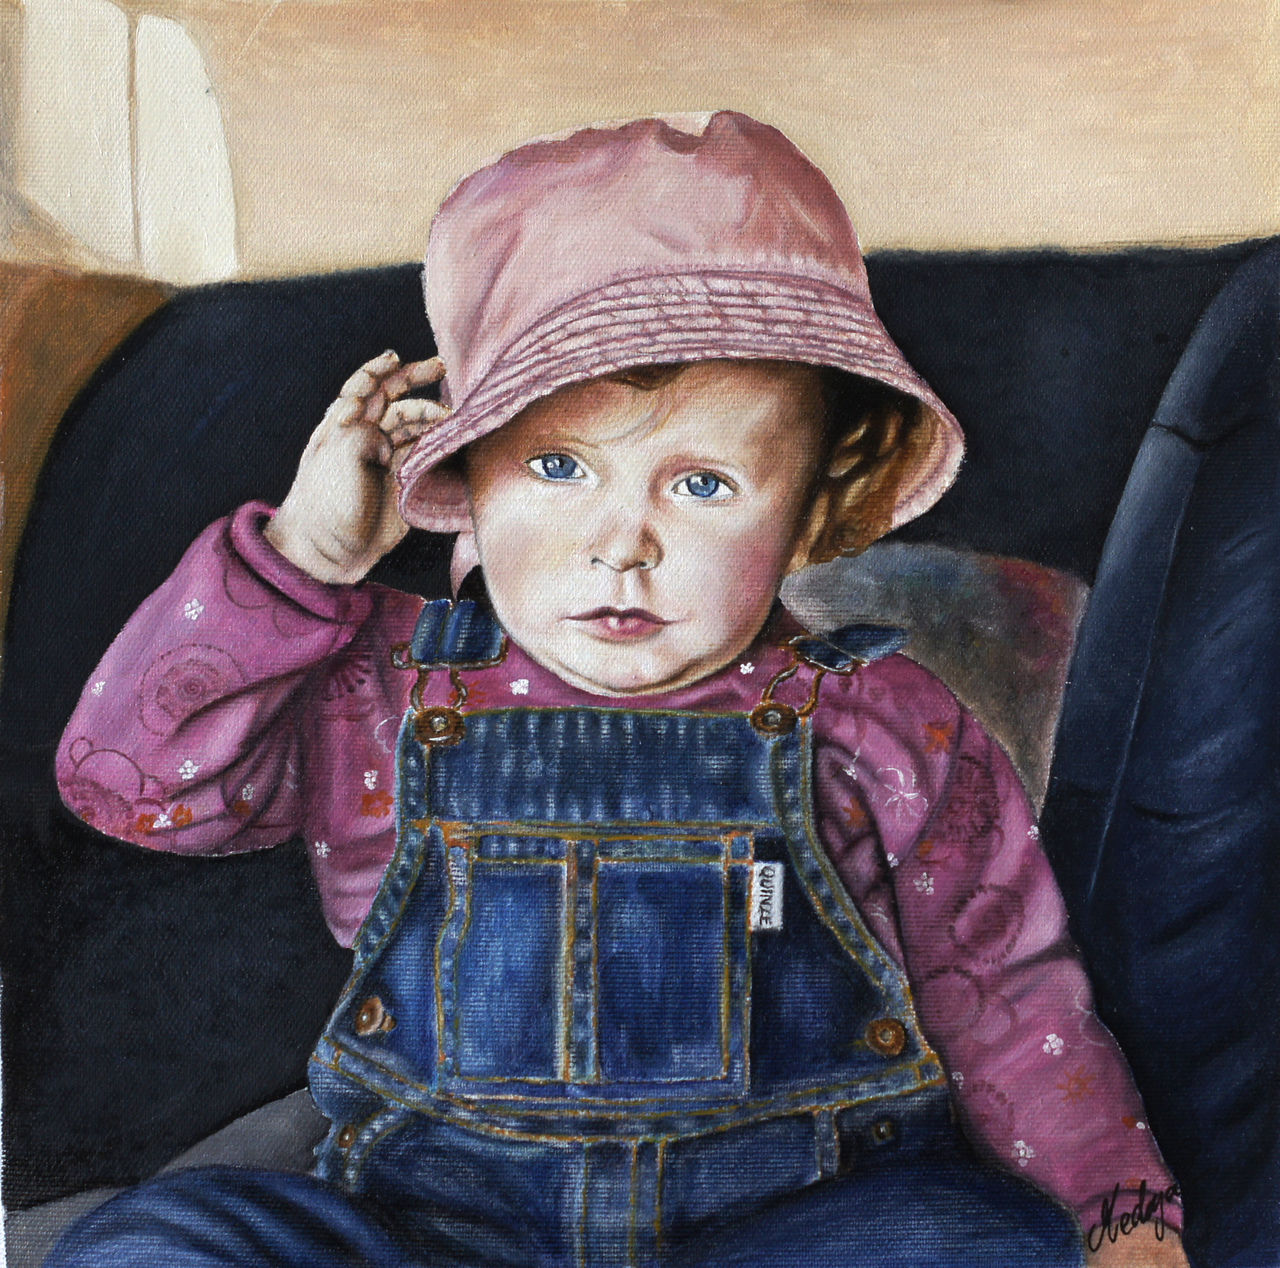 medeya lemdiya  petite fille au chapeau rose